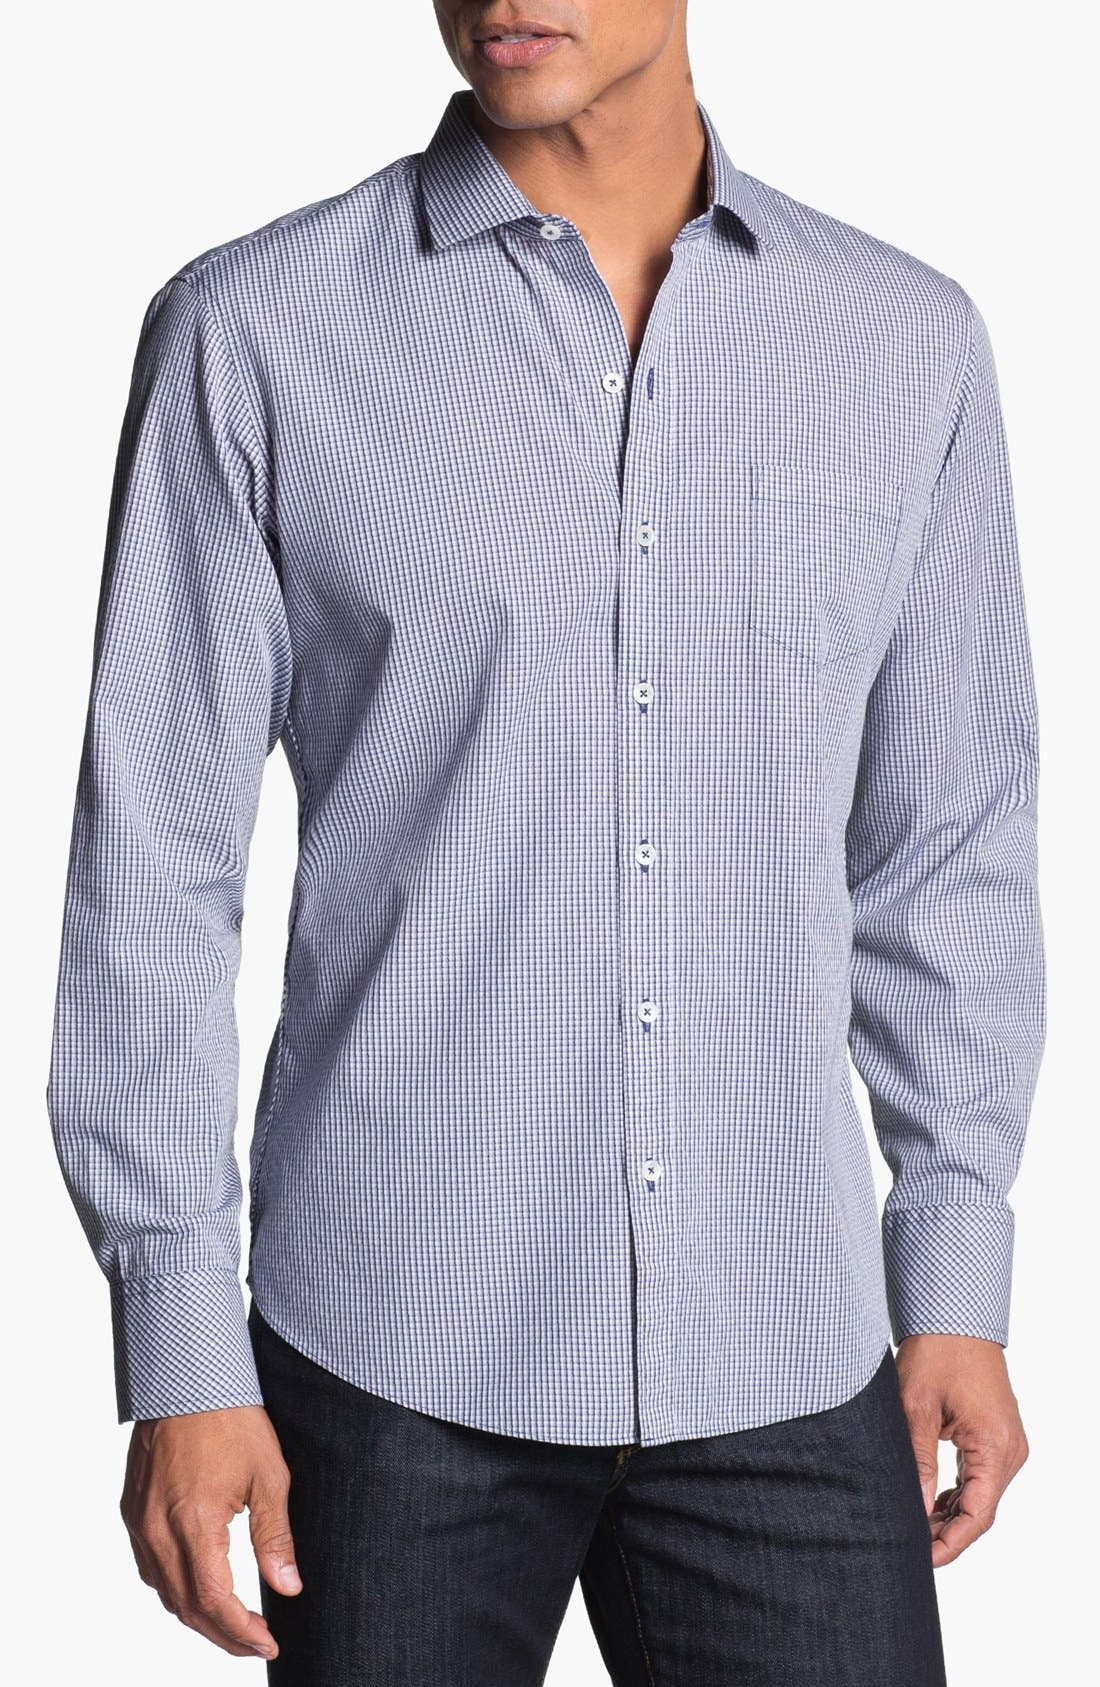 Alternate Image 1 Selected - Zachary Prell 'Boudreau' Sport Shirt